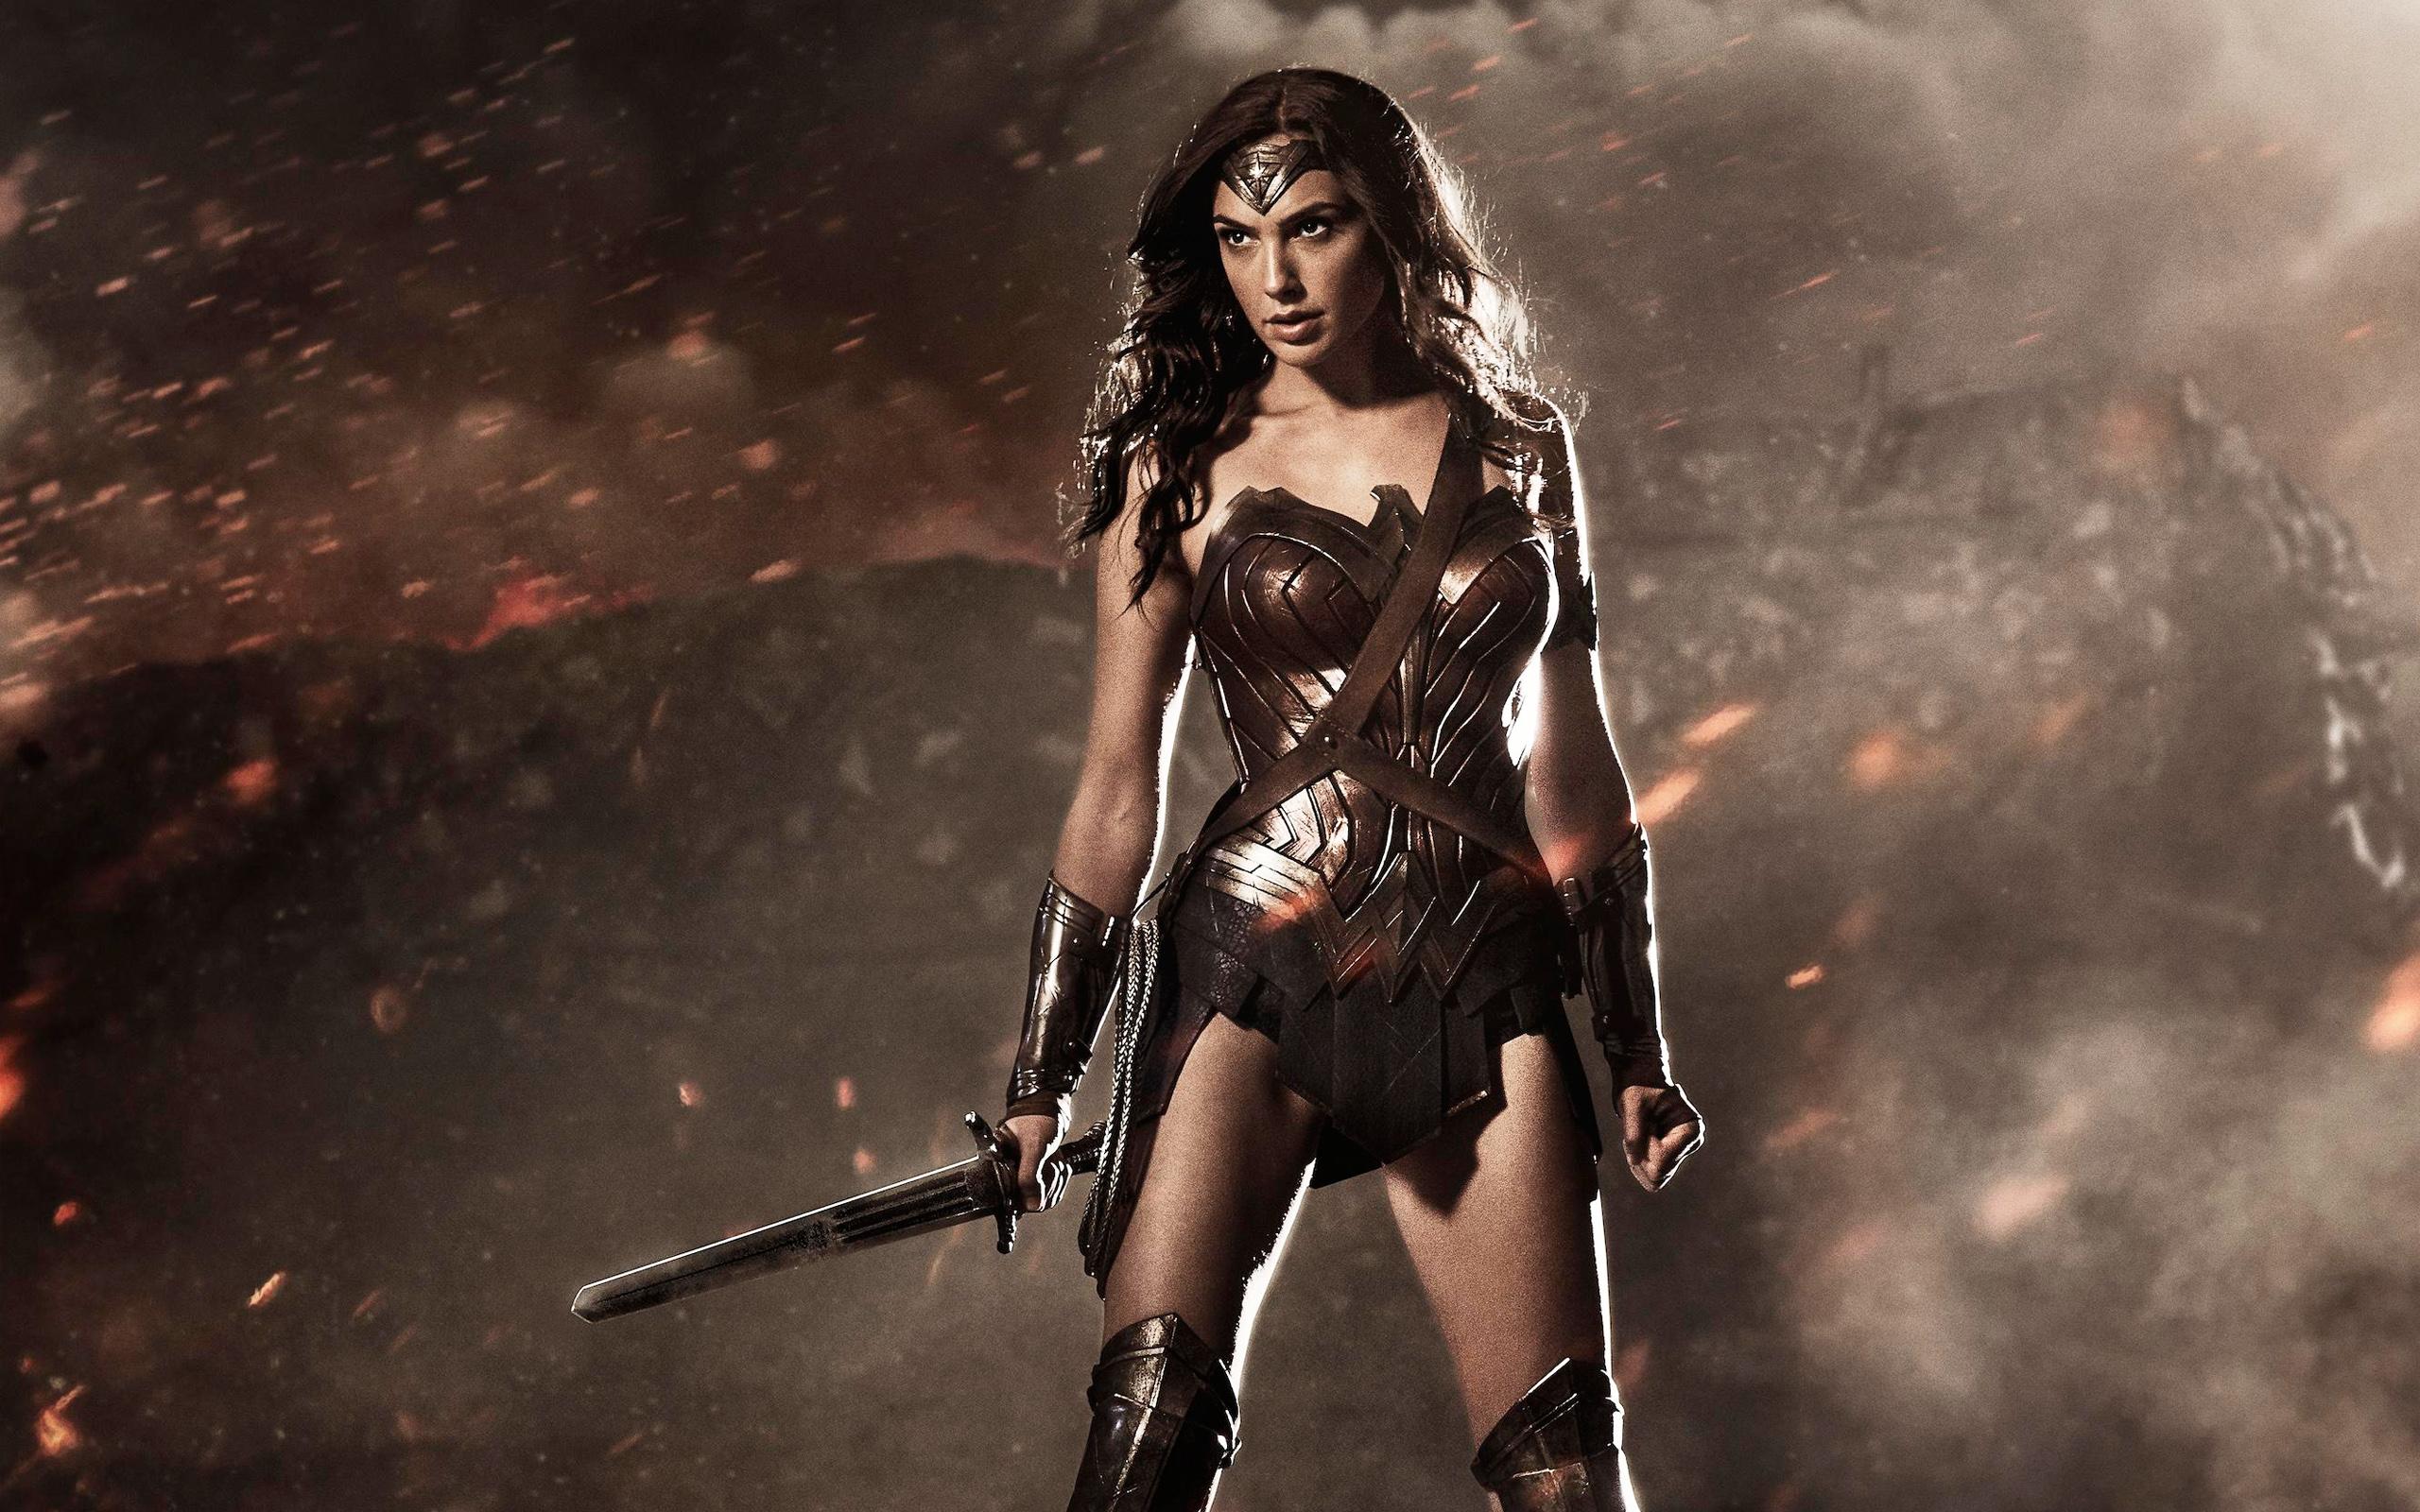 Wonder Woman Fondo De Pantalla Hd Fondo De Escritorio